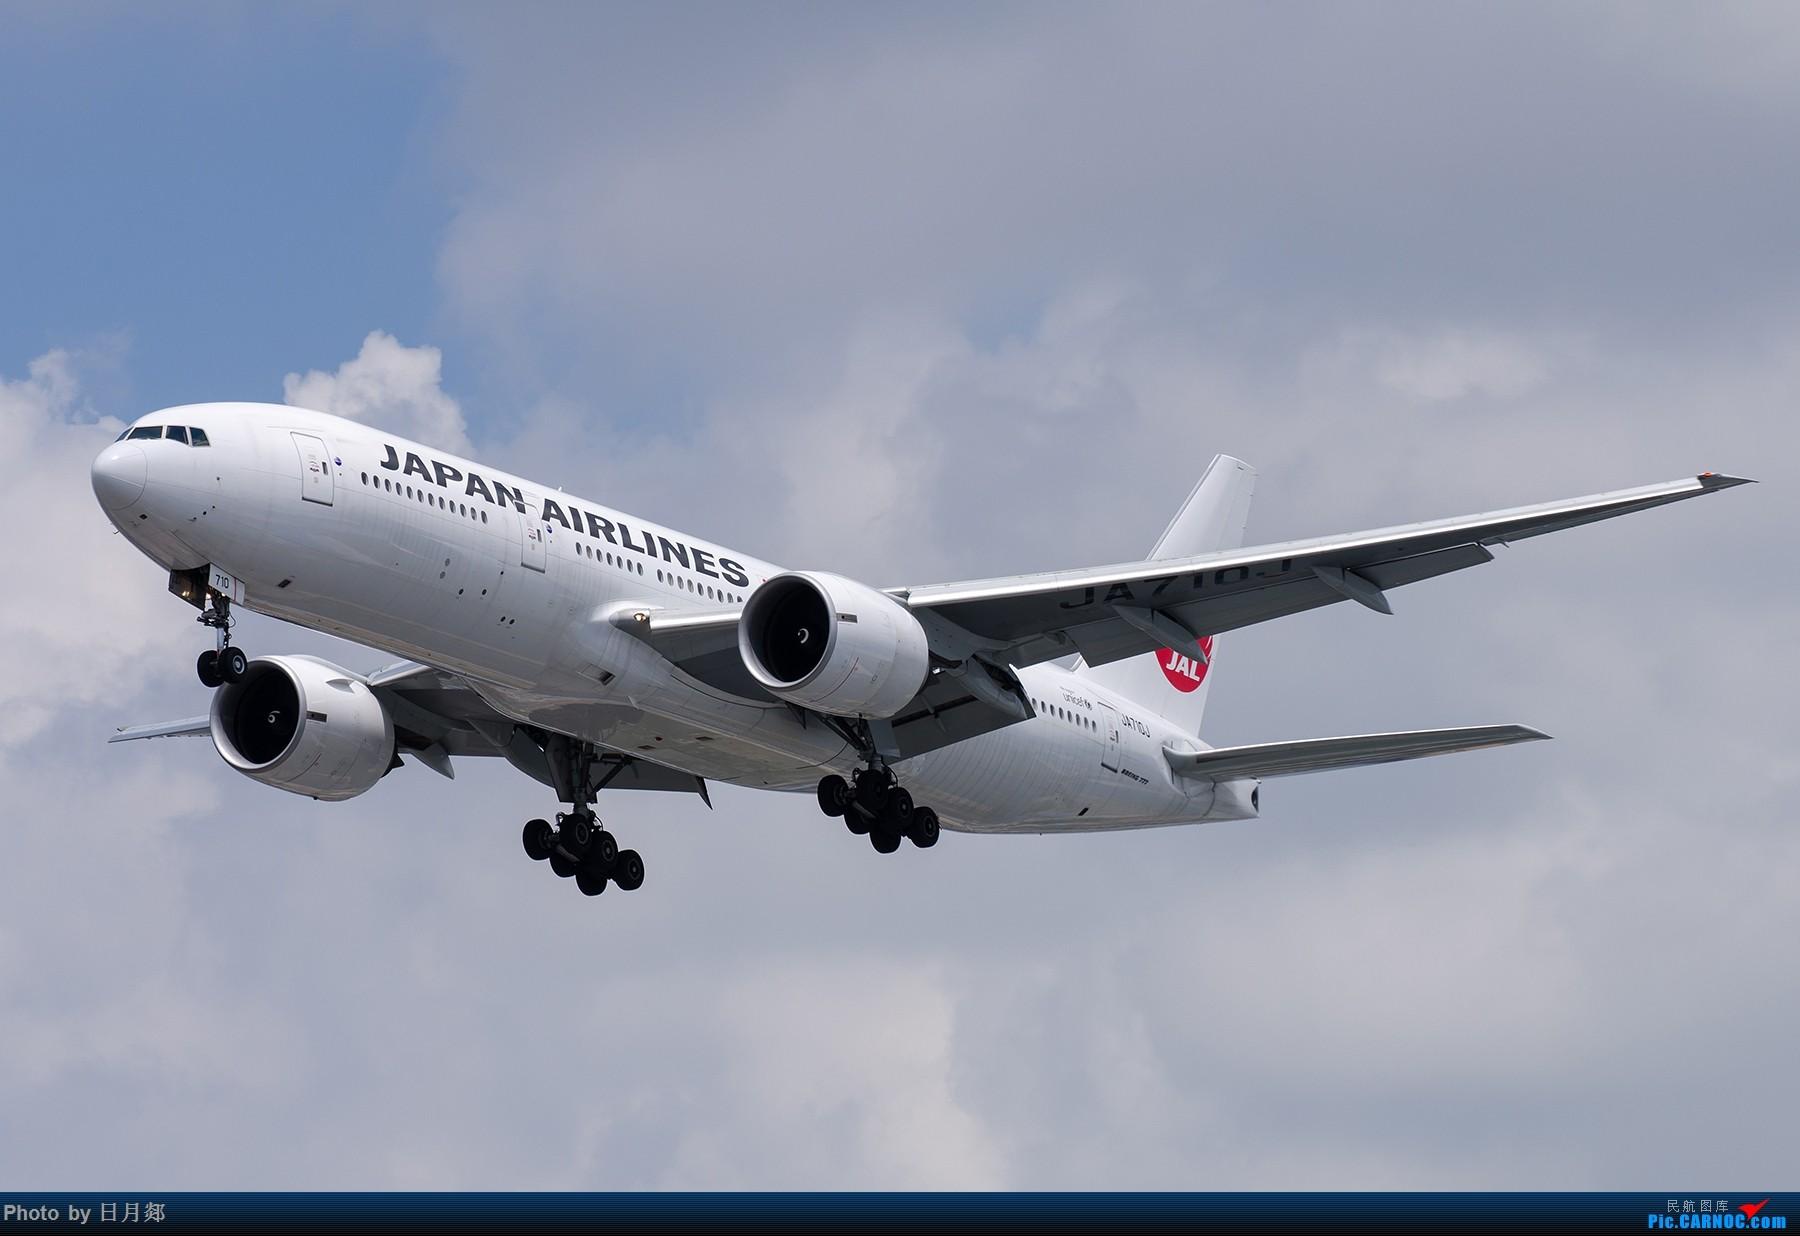 Re:[原创]【SHA拍机*1800大图】图要抓紧发,不然就要炒冷饭,大头镇贴 BOEING 777-200 JA710J 中国上海虹桥国际机场